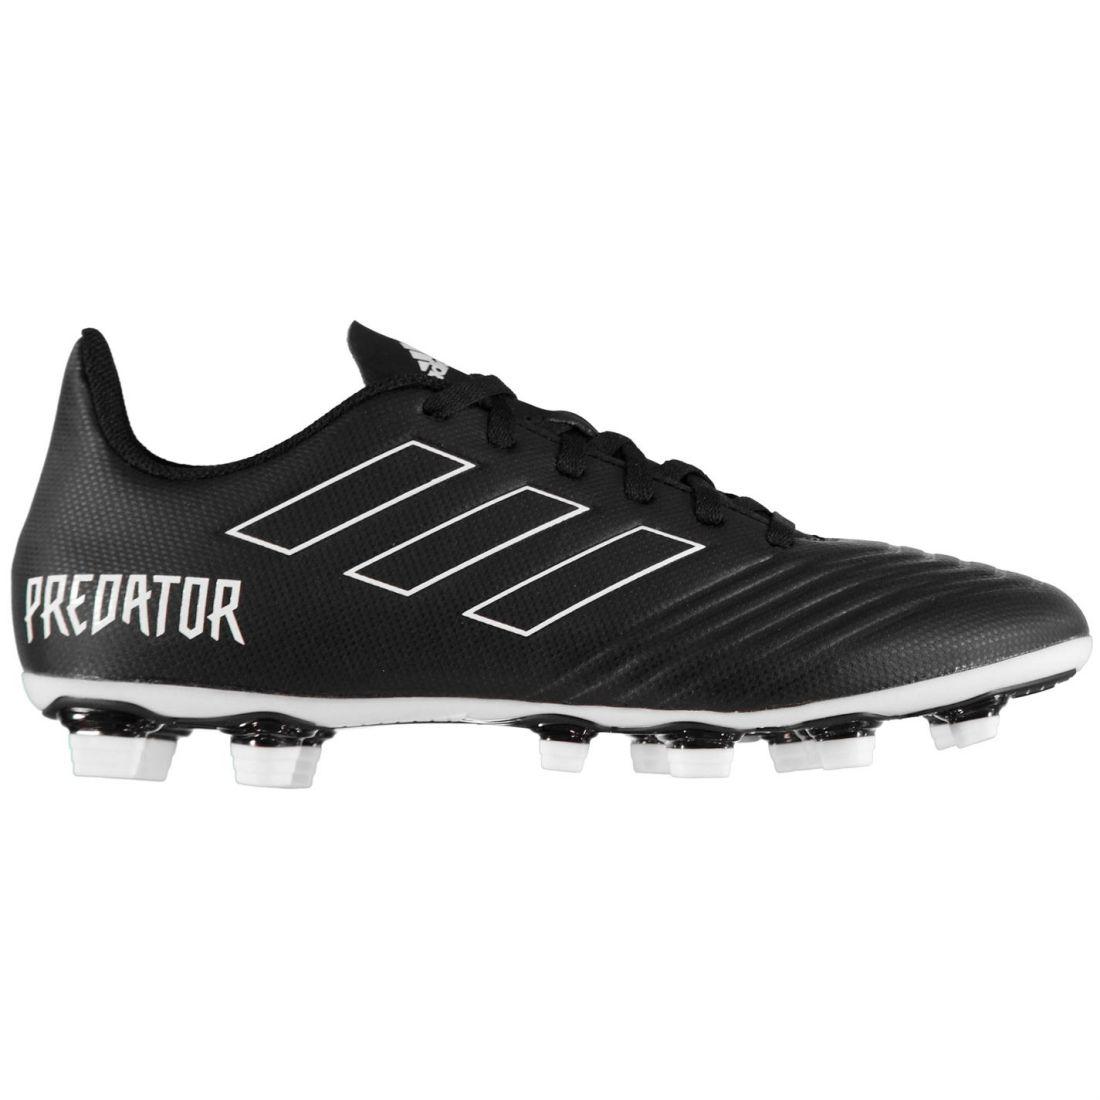 adidas Predator 18.4 FG Football Boots Mens Gents Firm Ground Laces ... cf2a0de6231